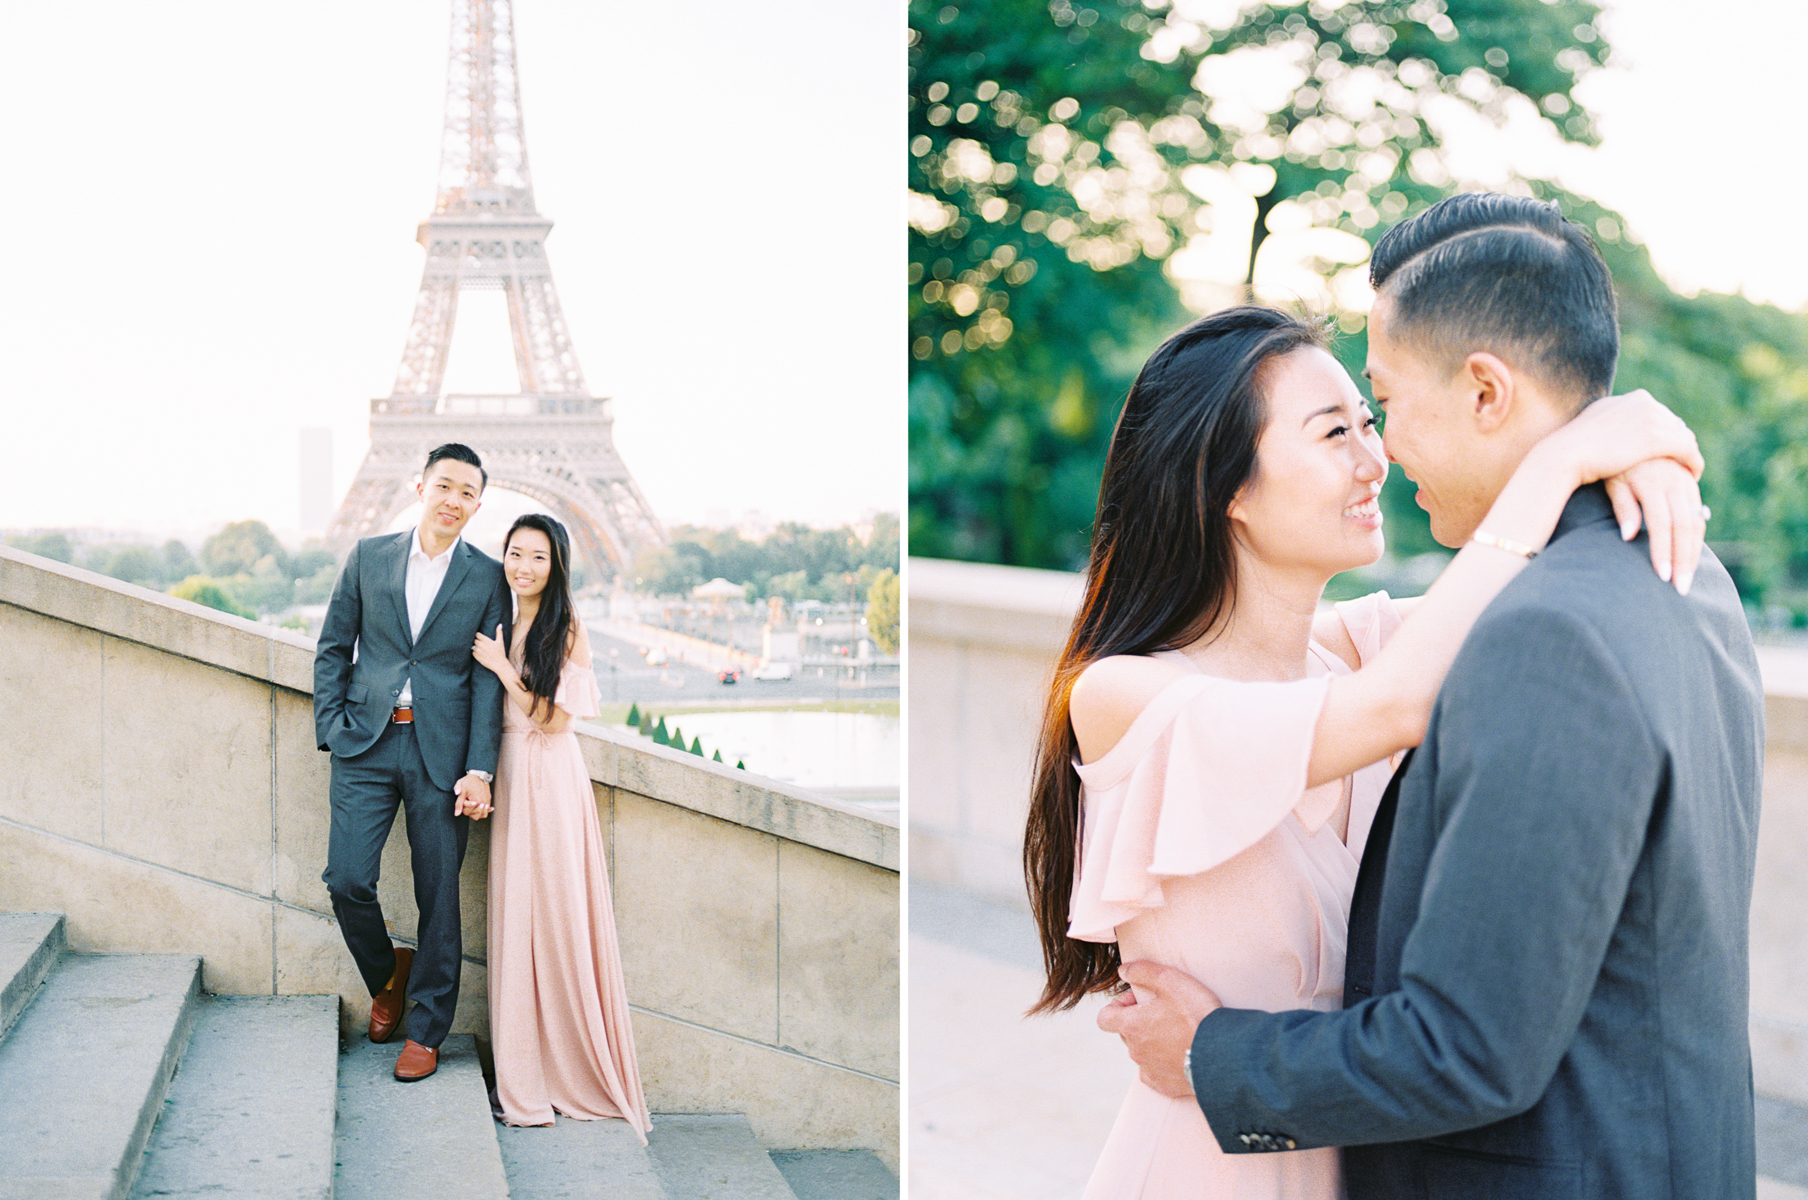 film_wedding_photographer_fine_art_los_angeles_48.jpg